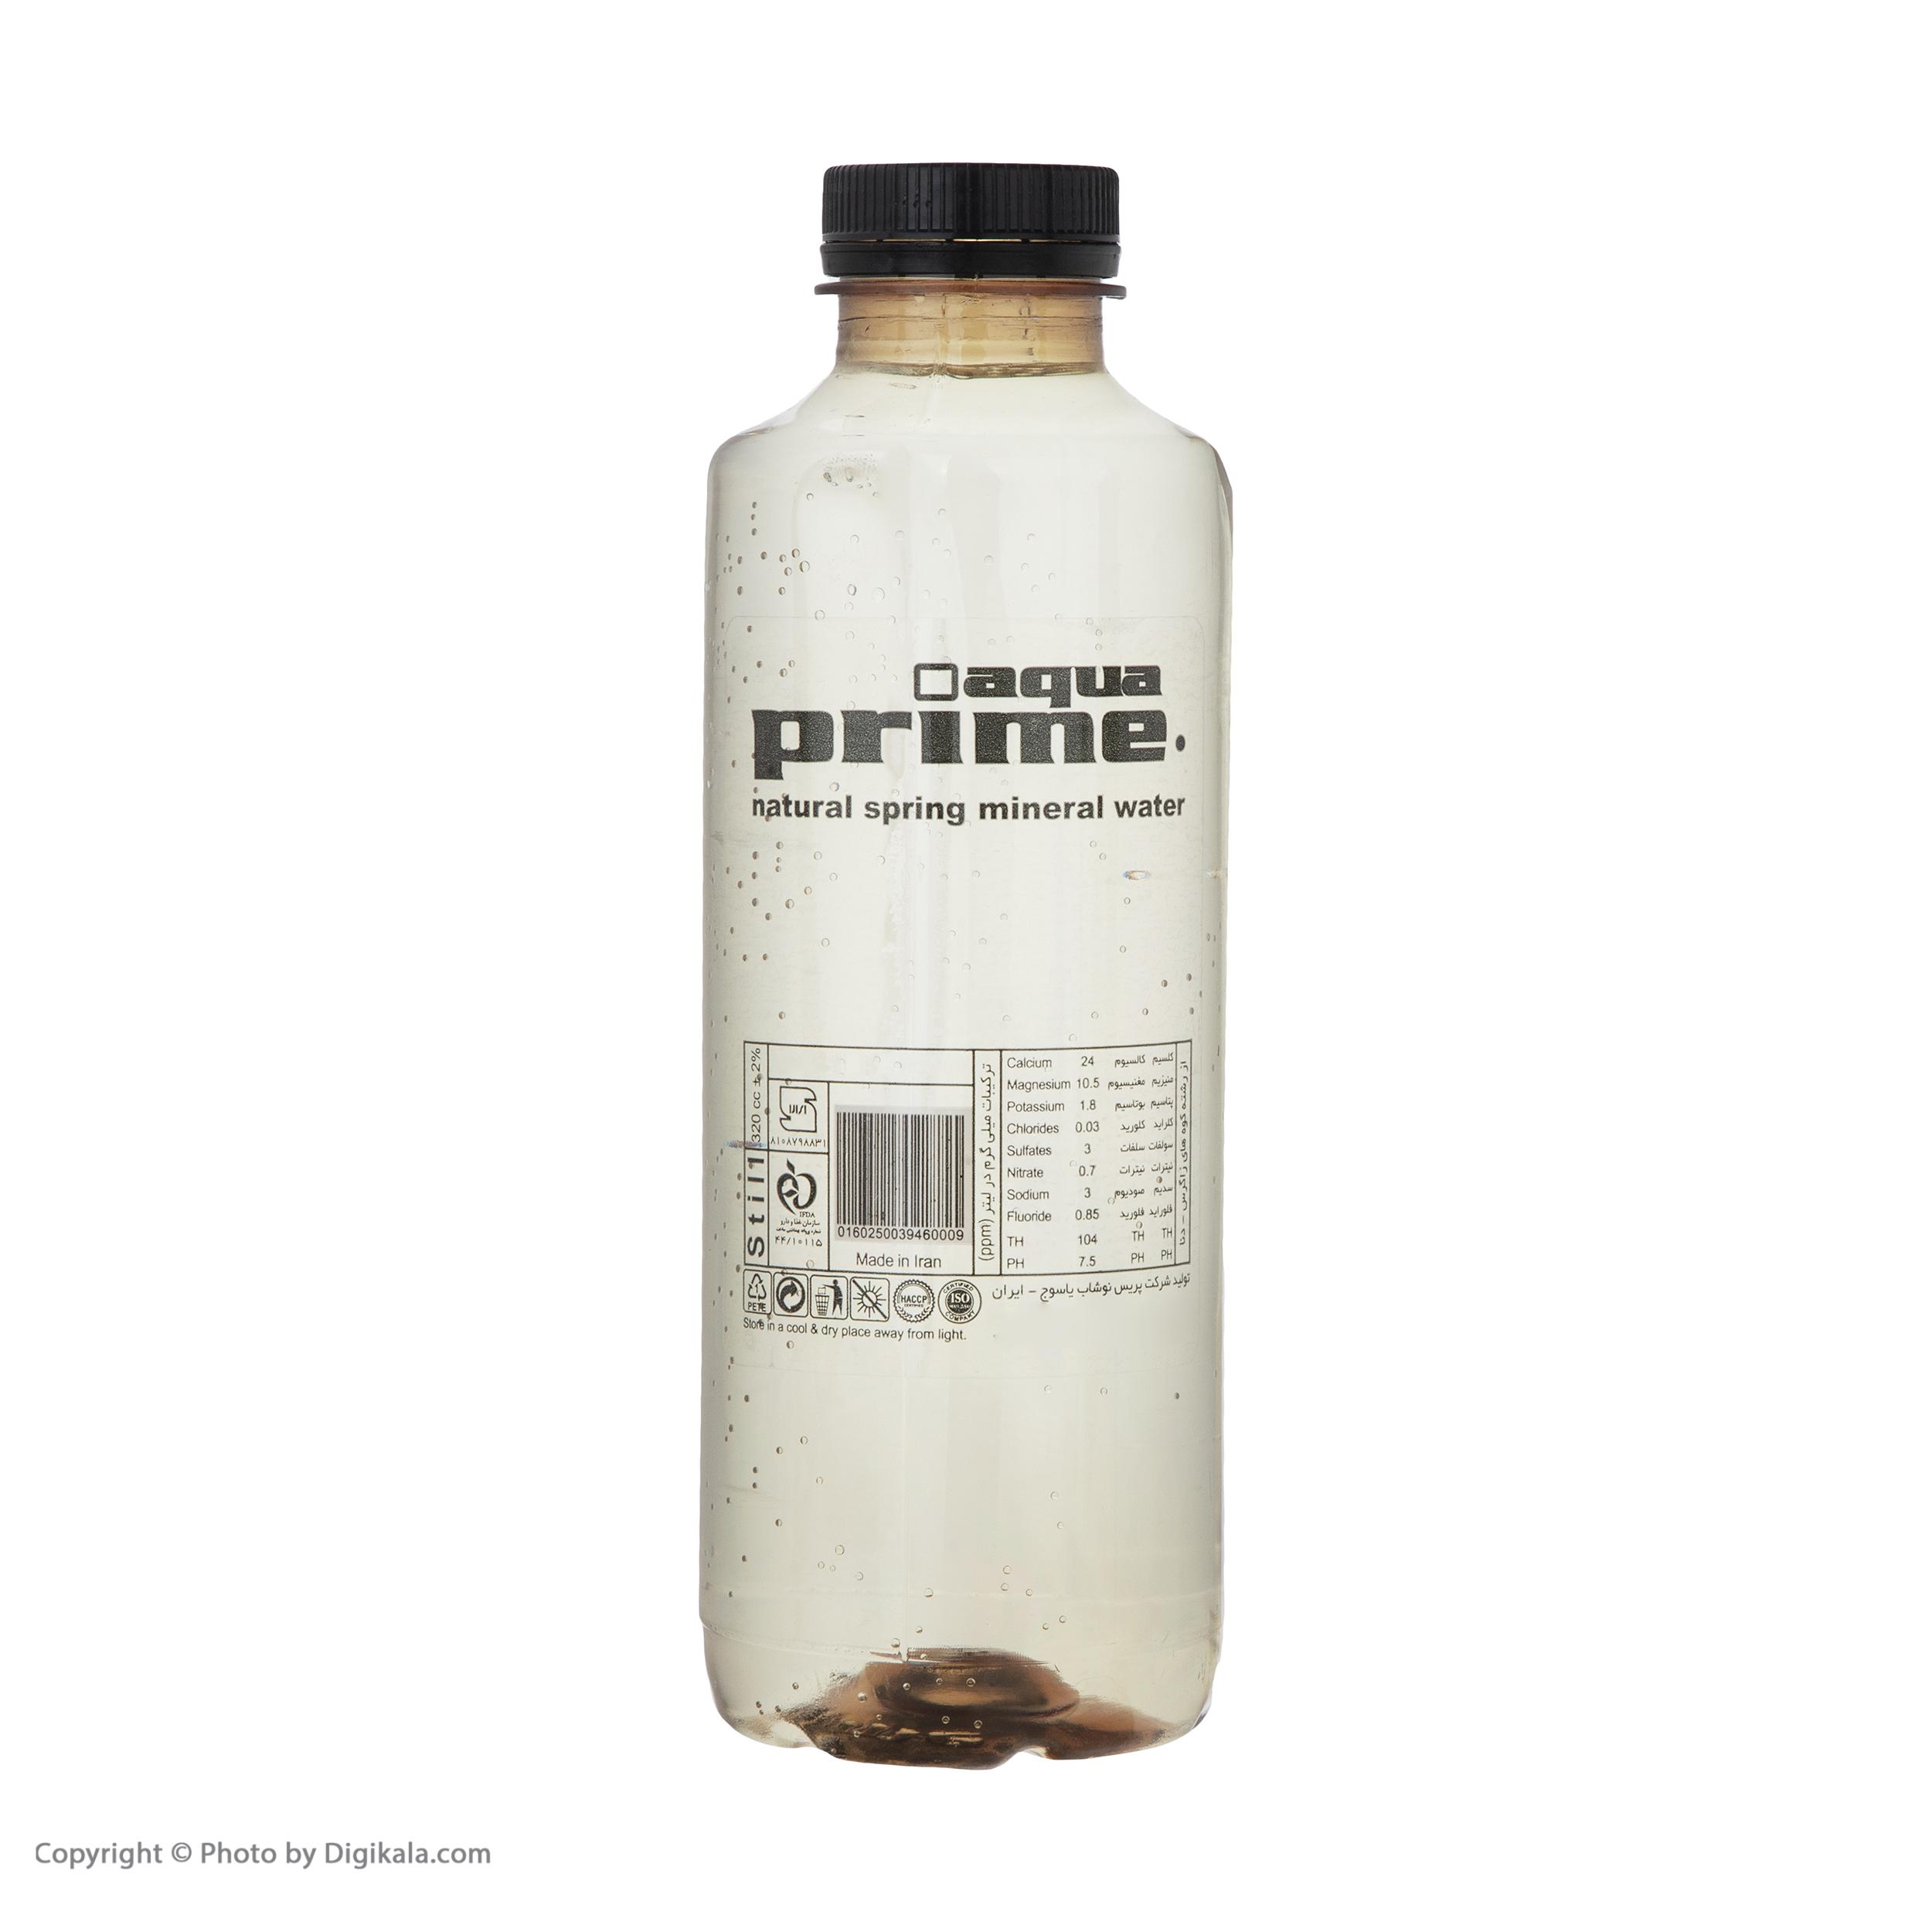 آب معدنی آکوا پرایم ویژه -300 میلی لیتر بسته 12 عددی main 1 6